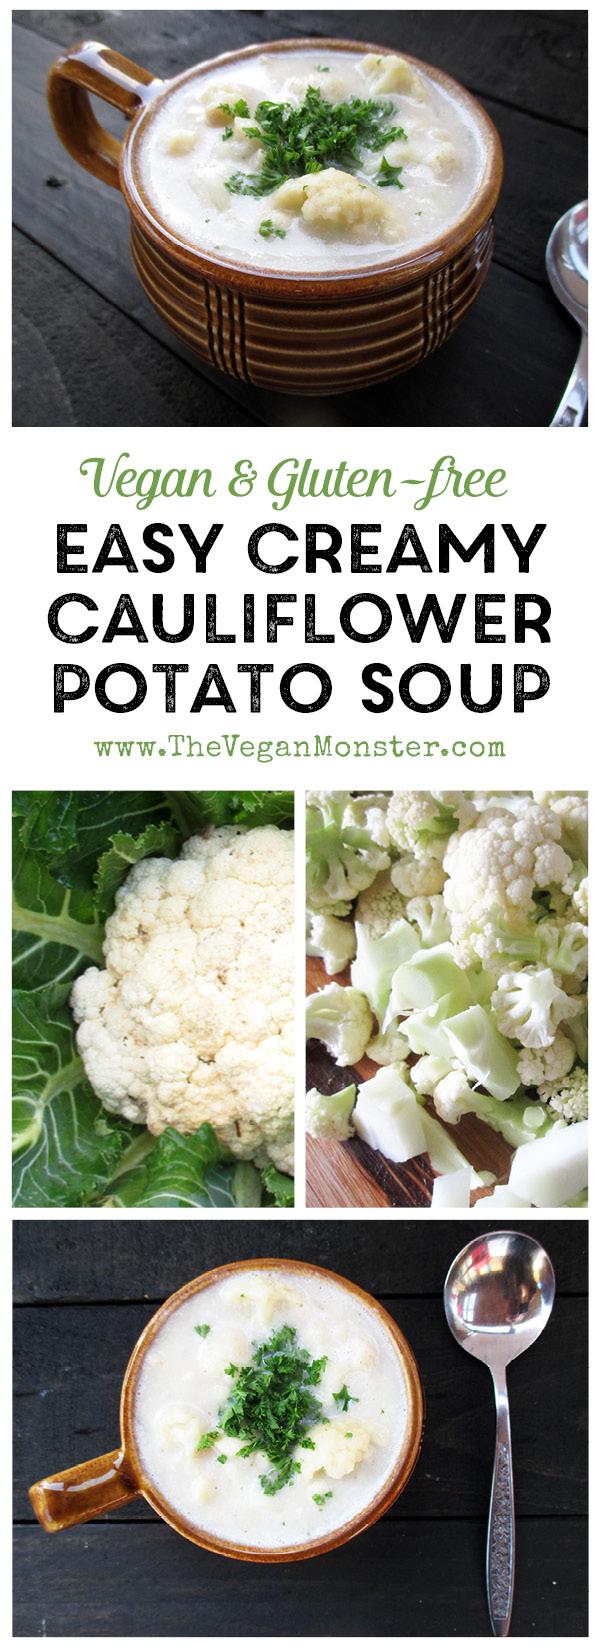 Easy Creamy Cauli Potato Soup (Vegan, Gluten-free) | The Vegan Monster